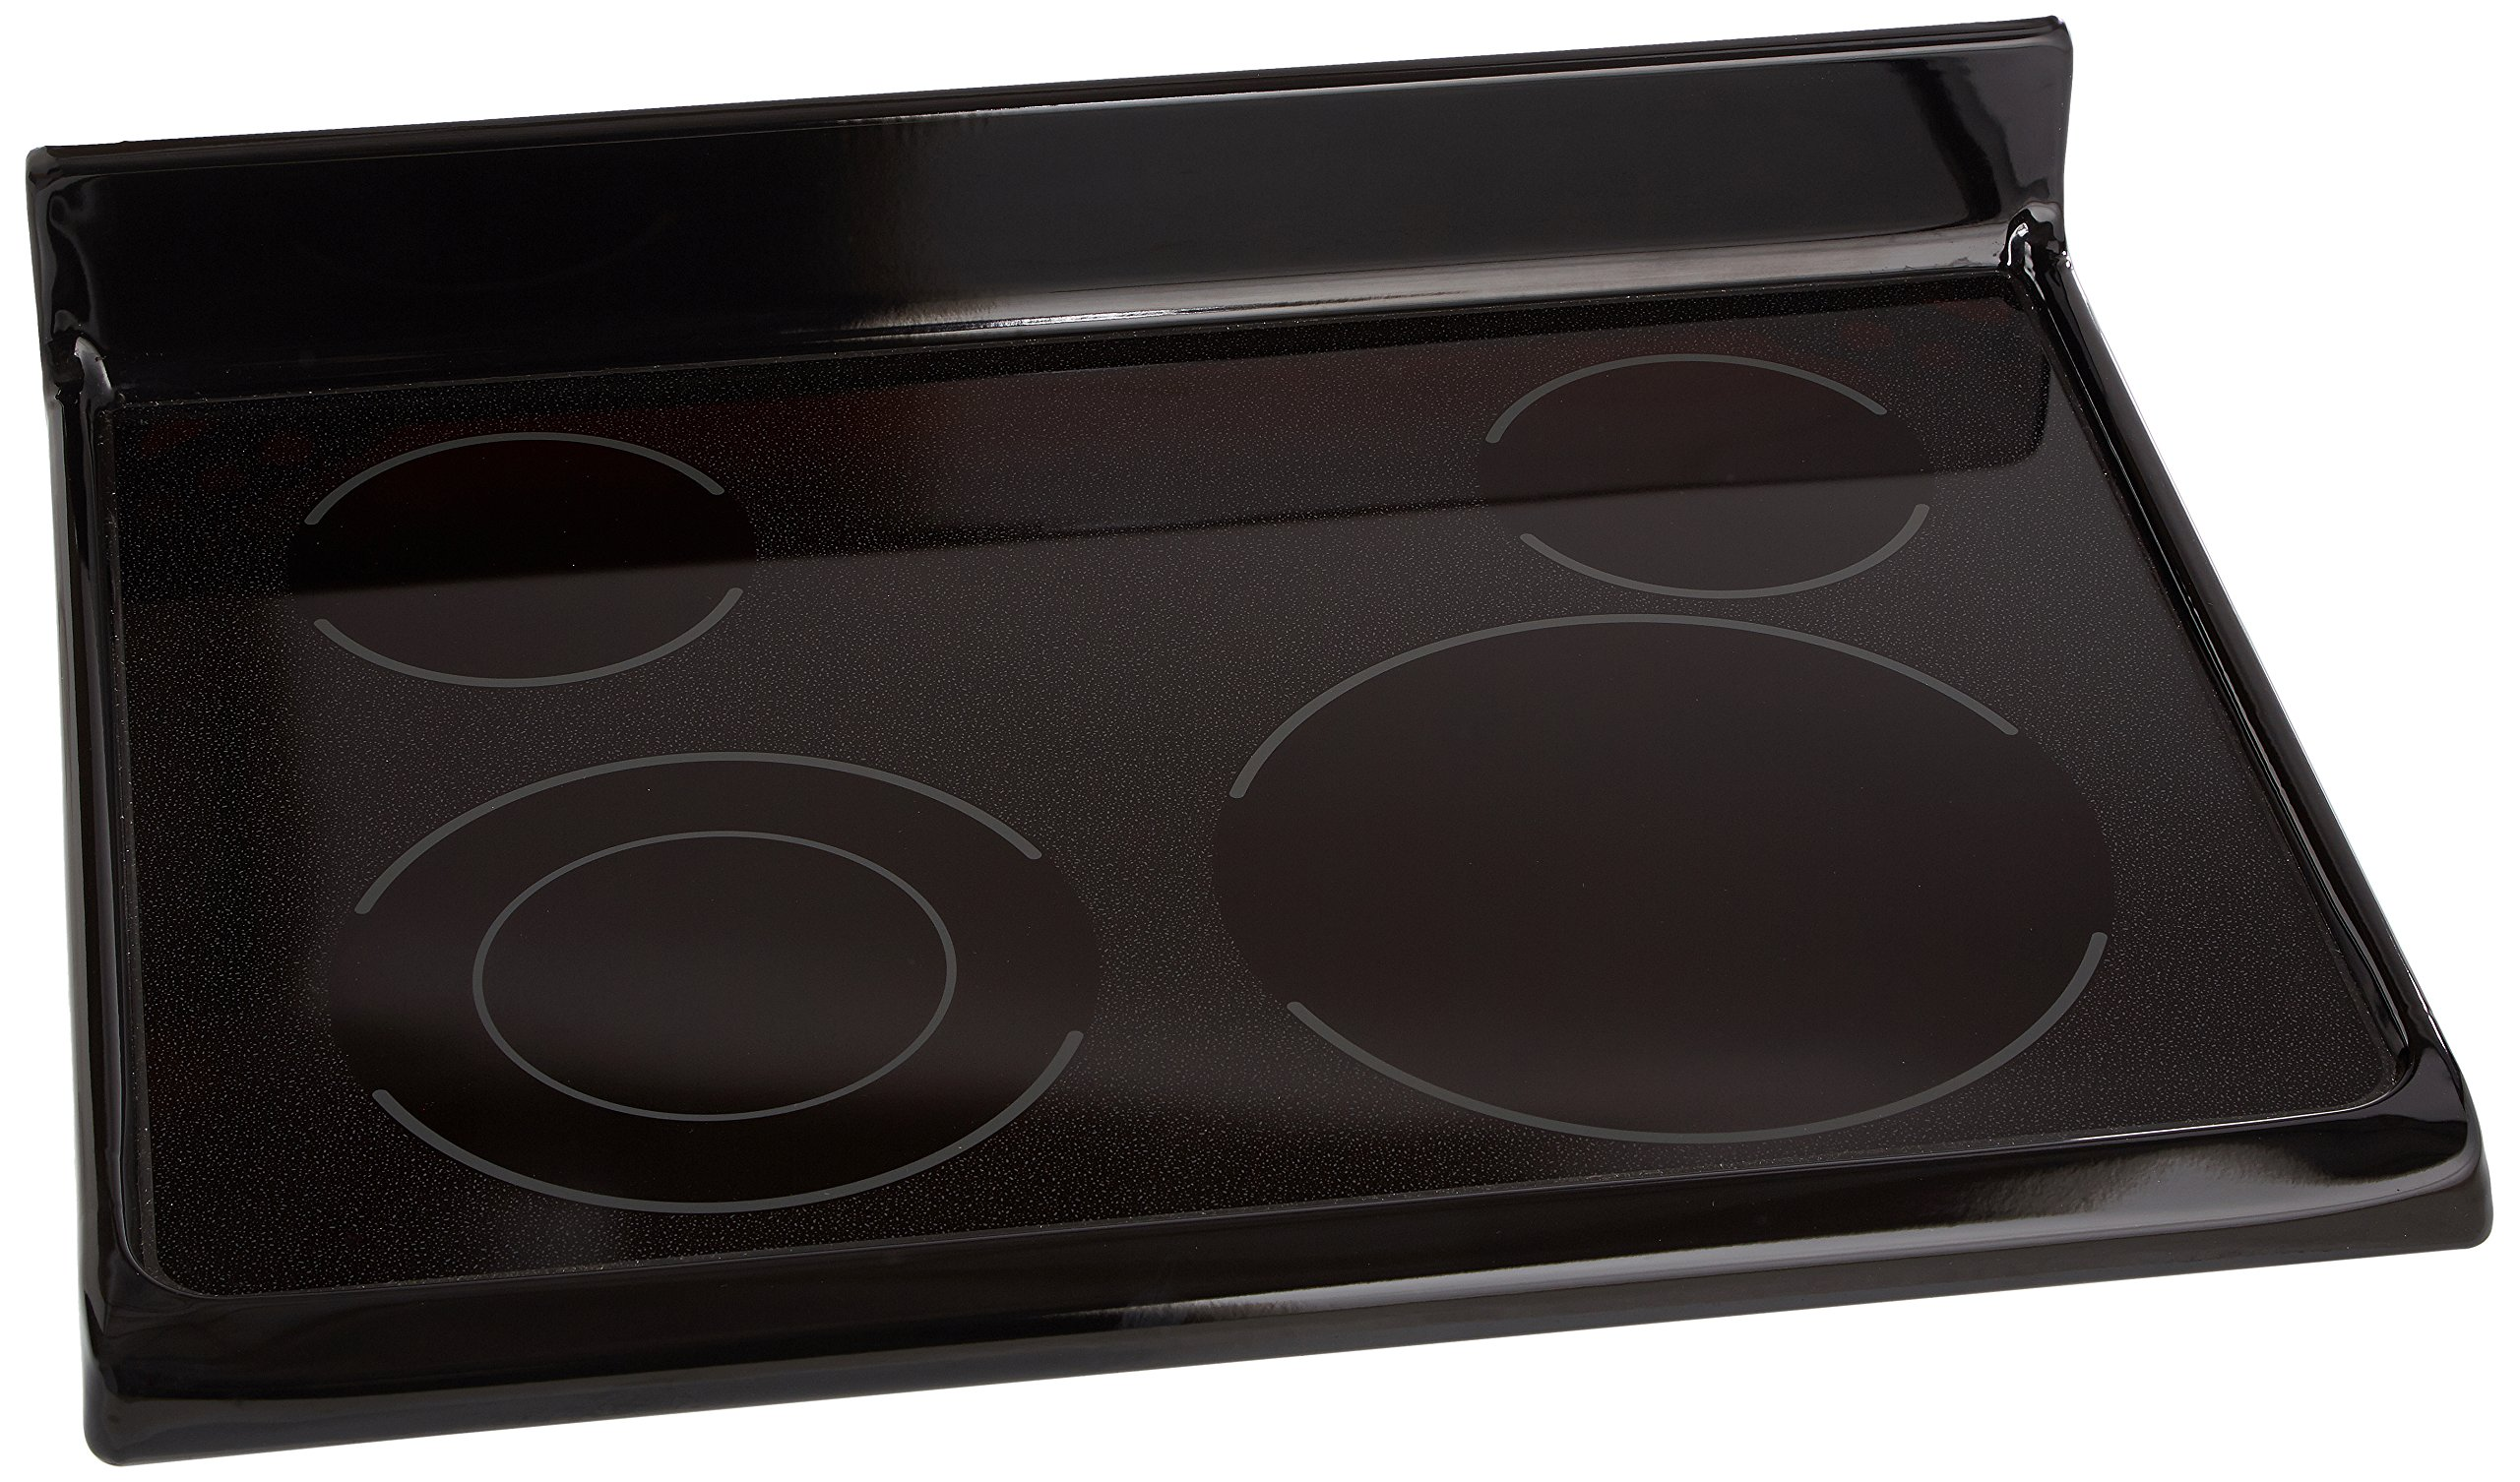 Frigidaire 316282902 Range/Stove/Oven Glass Cooktop